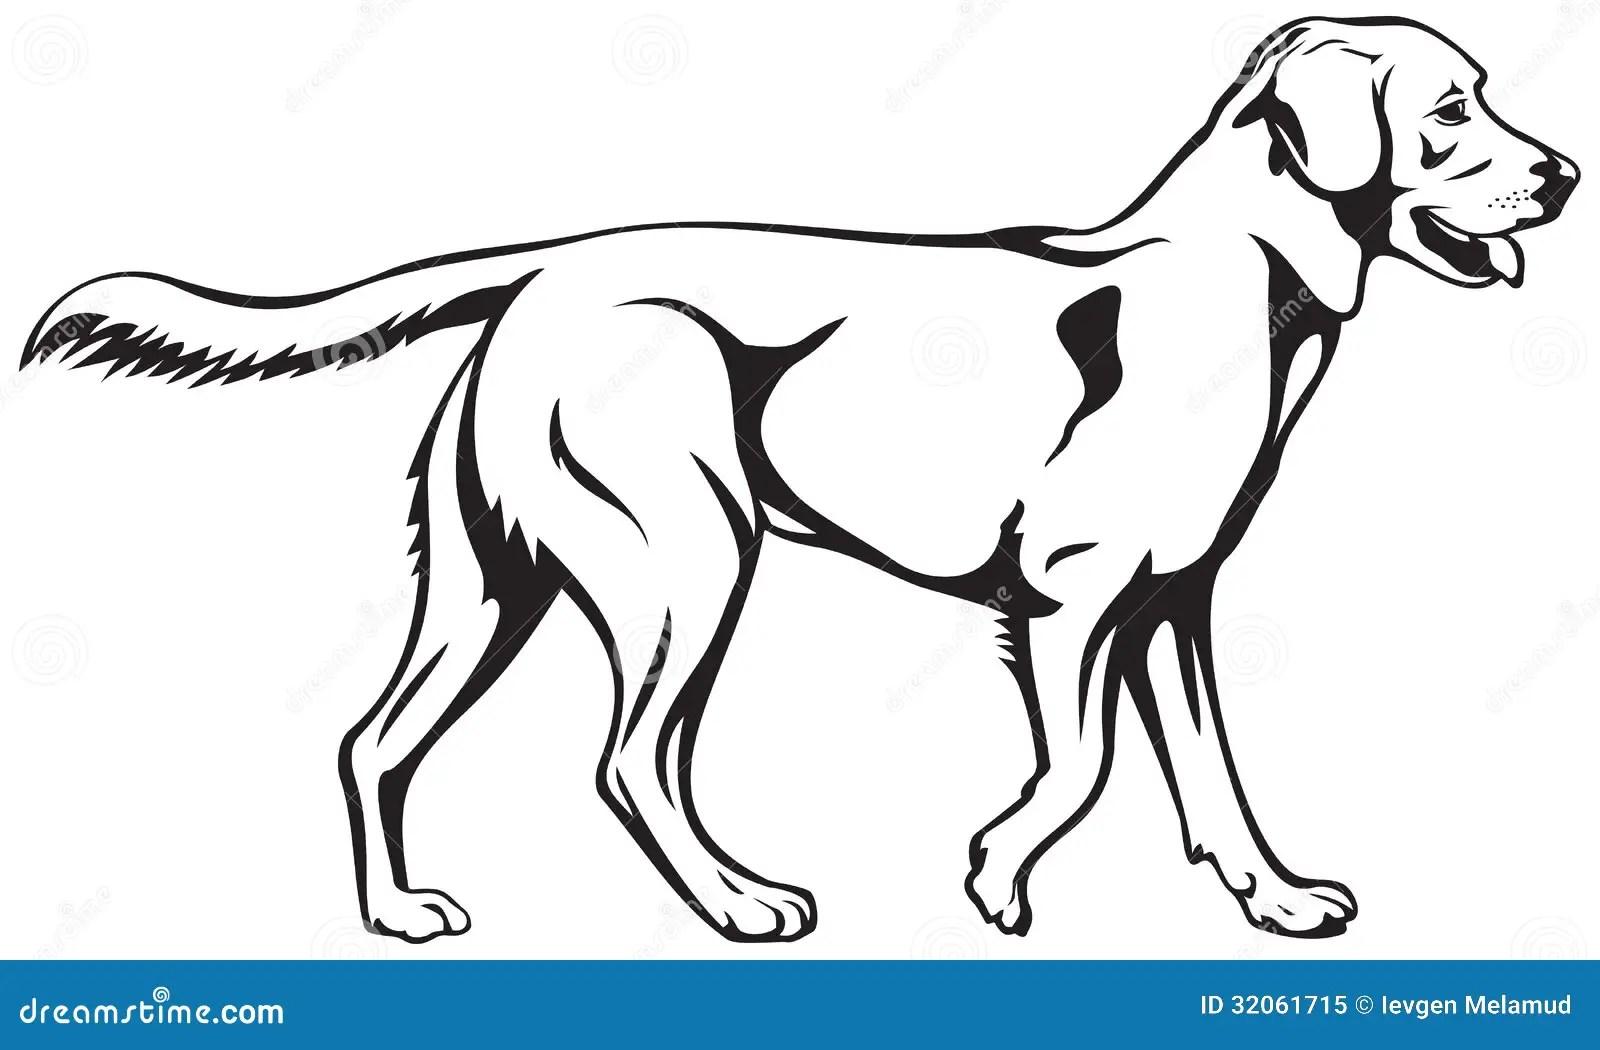 Labrador Retriever Dog Breed Royalty Free Stock Photo